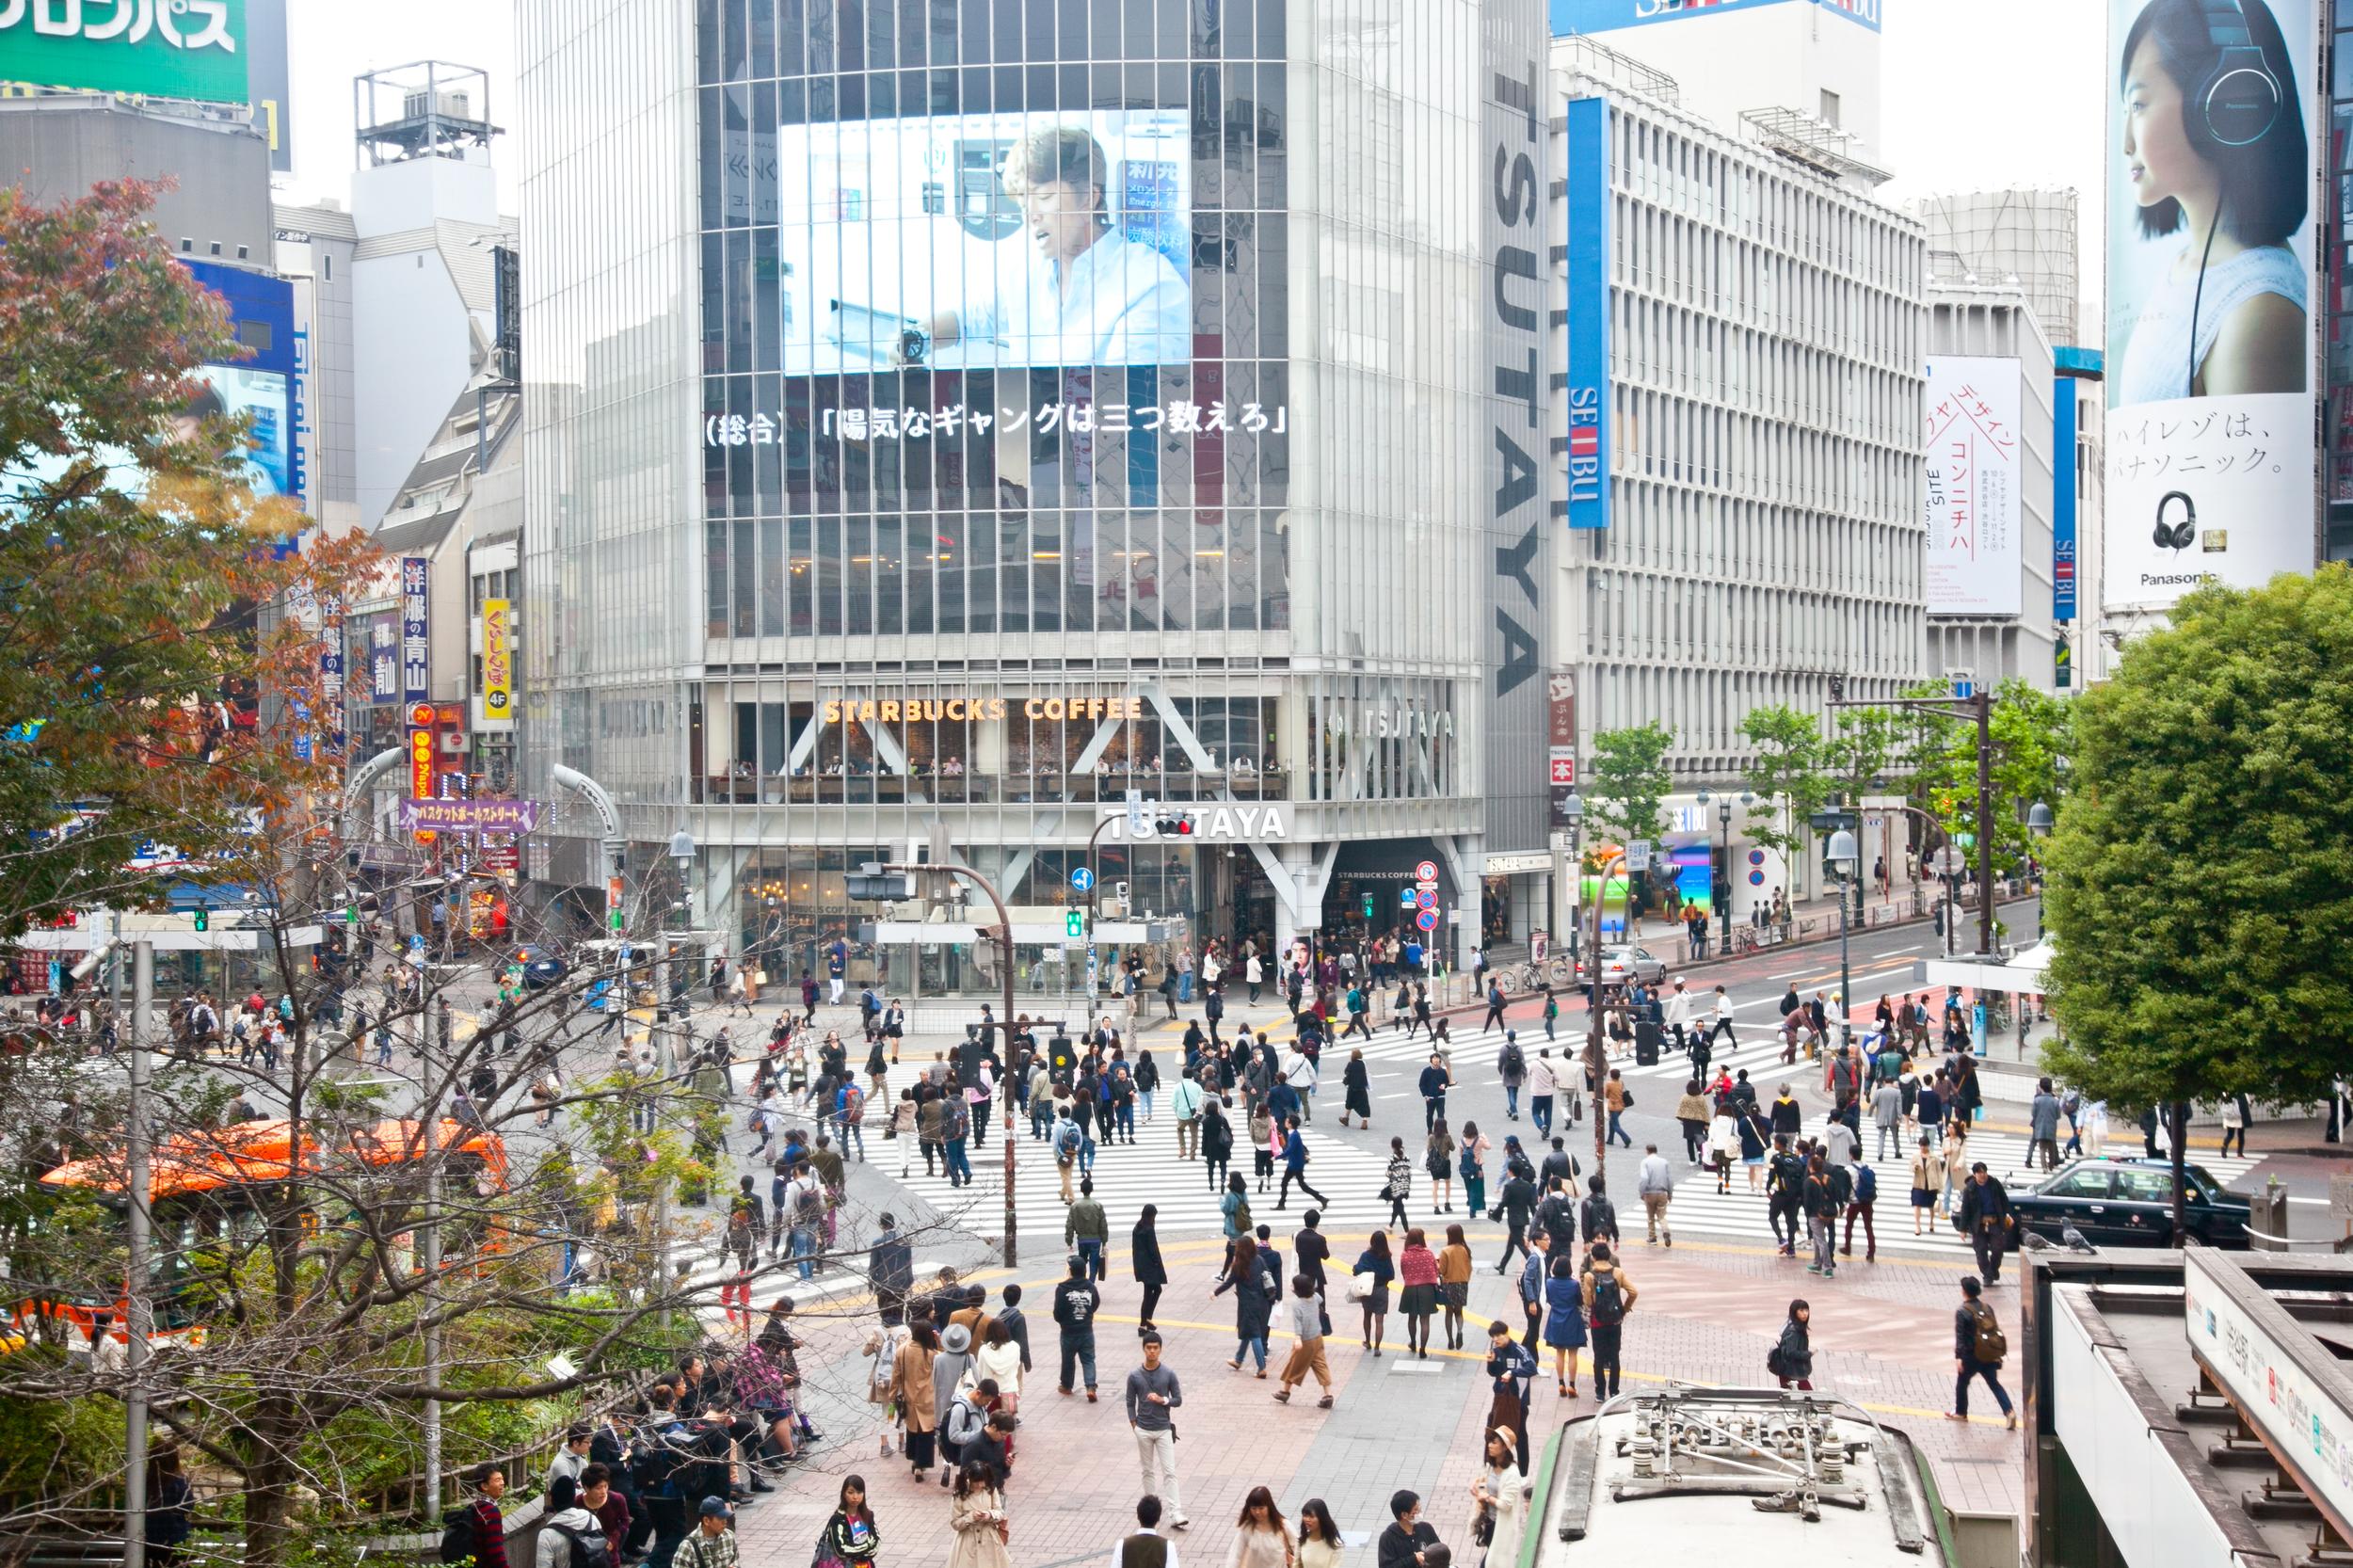 Shibuya Crossing  (as seen from Shibuya Station)